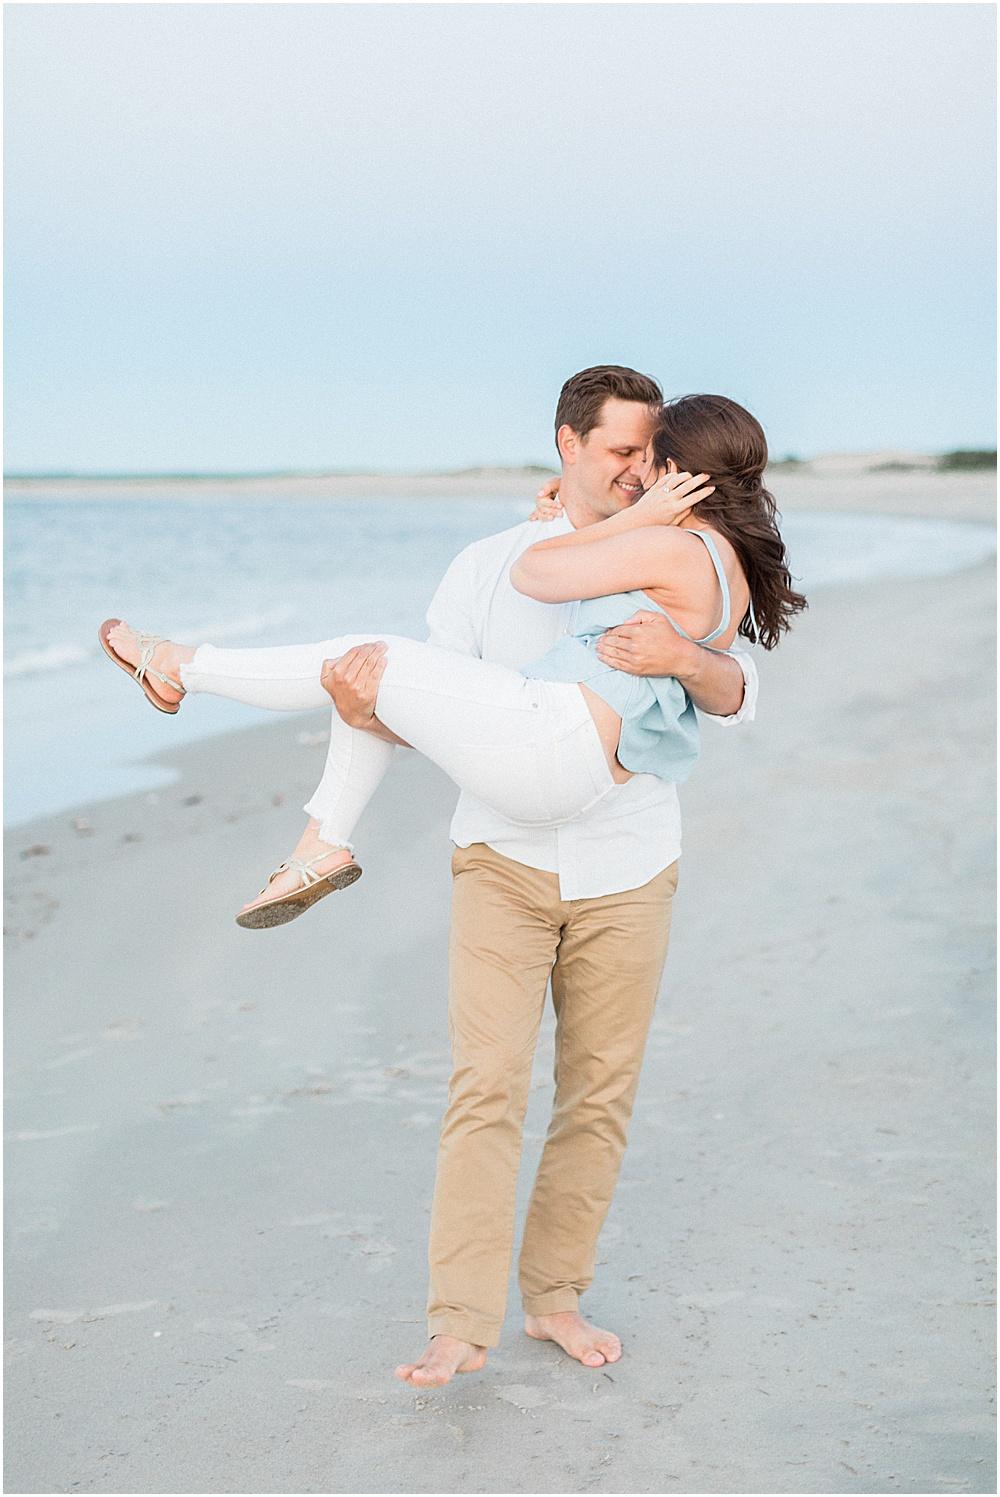 crane_estate_beach_engagement_ipswich_les_fleurs_andover_lyndsay_simon_beauty_massachusetts_boston_wedding_photographer_meredith_jane_photography_photo_0339.jpg